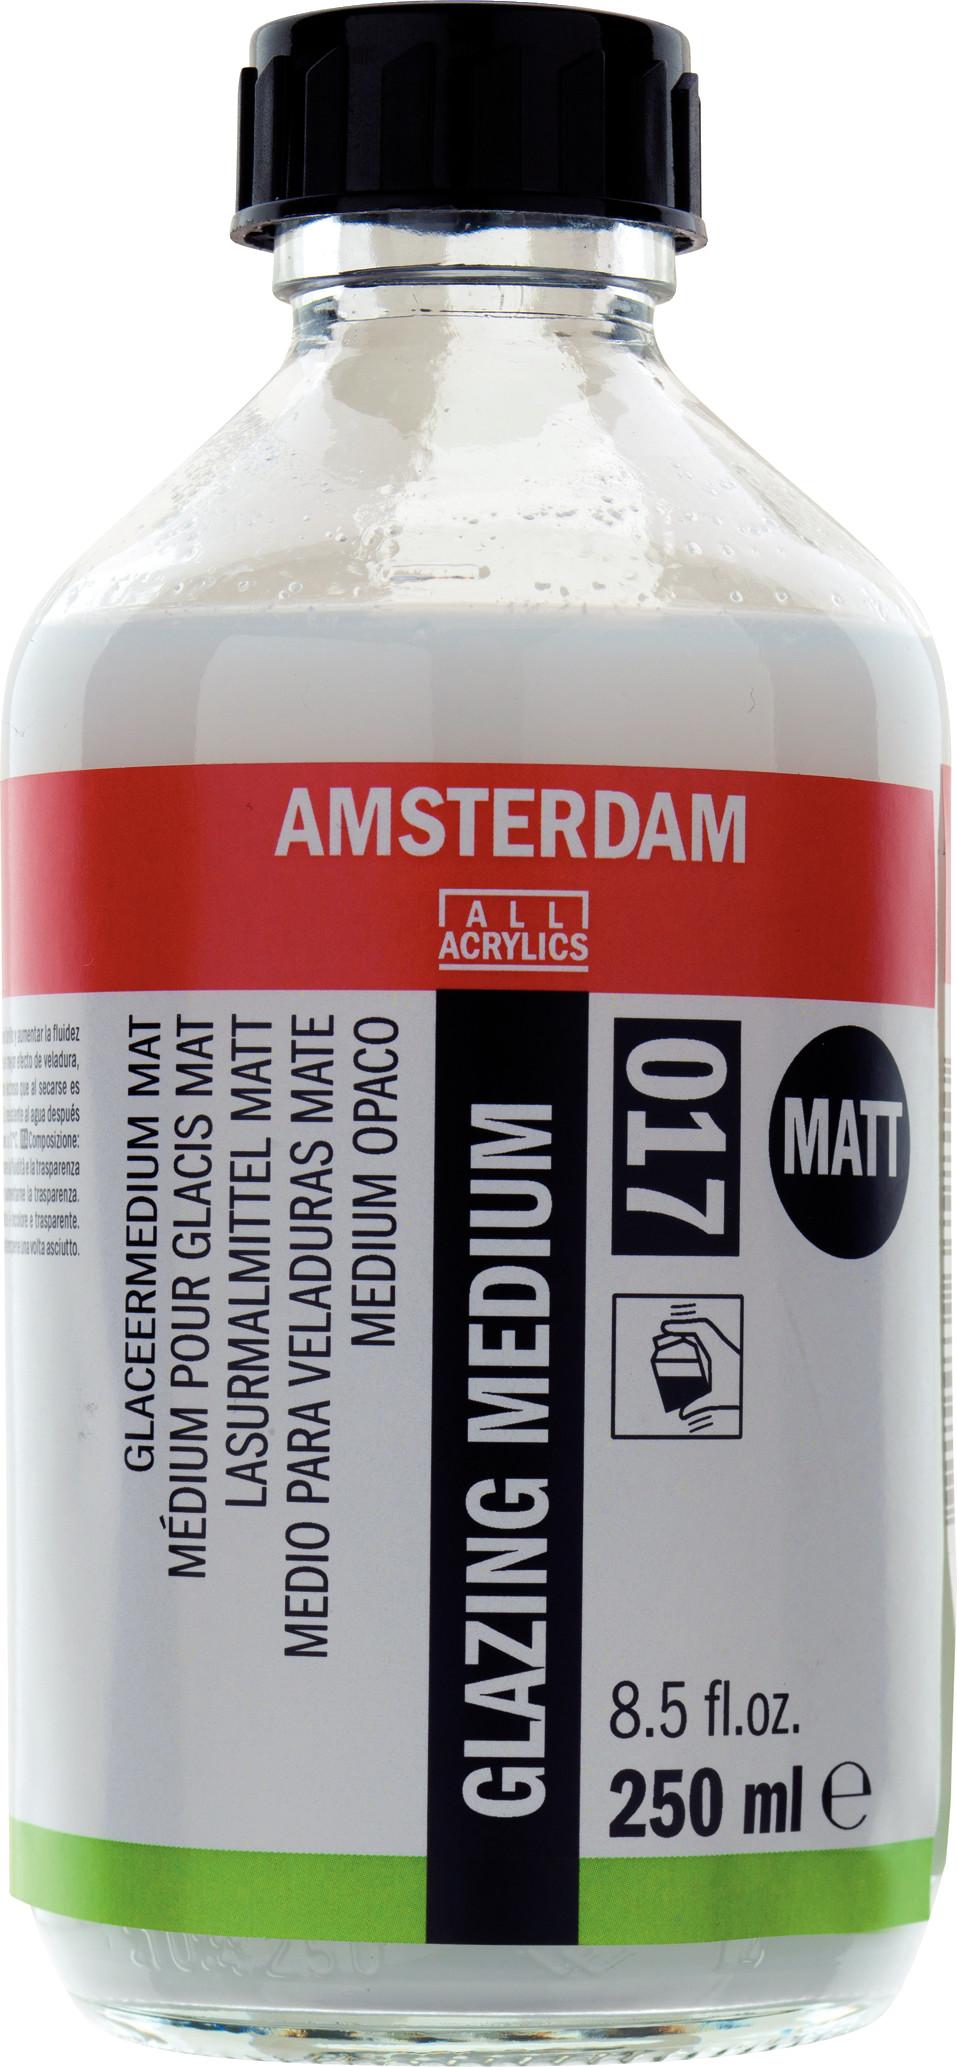 Amsterdam Glazing Medium Matt Bottle 250 ml